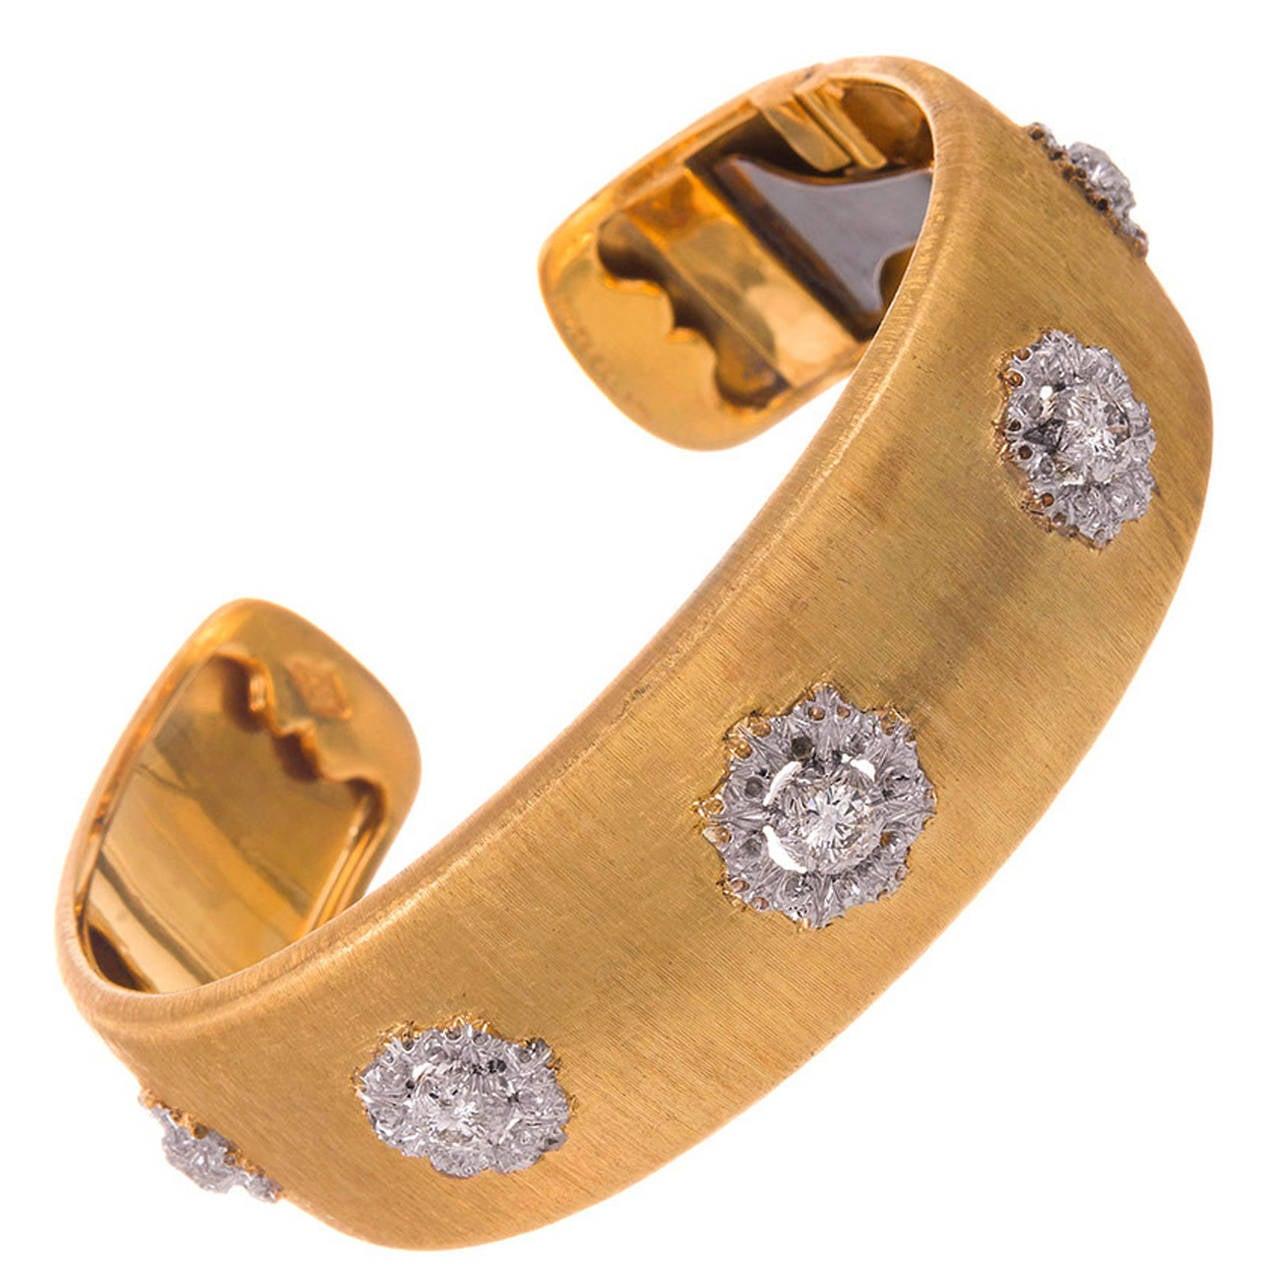 Buccellati Diamond Cluster Cuff Bracelet